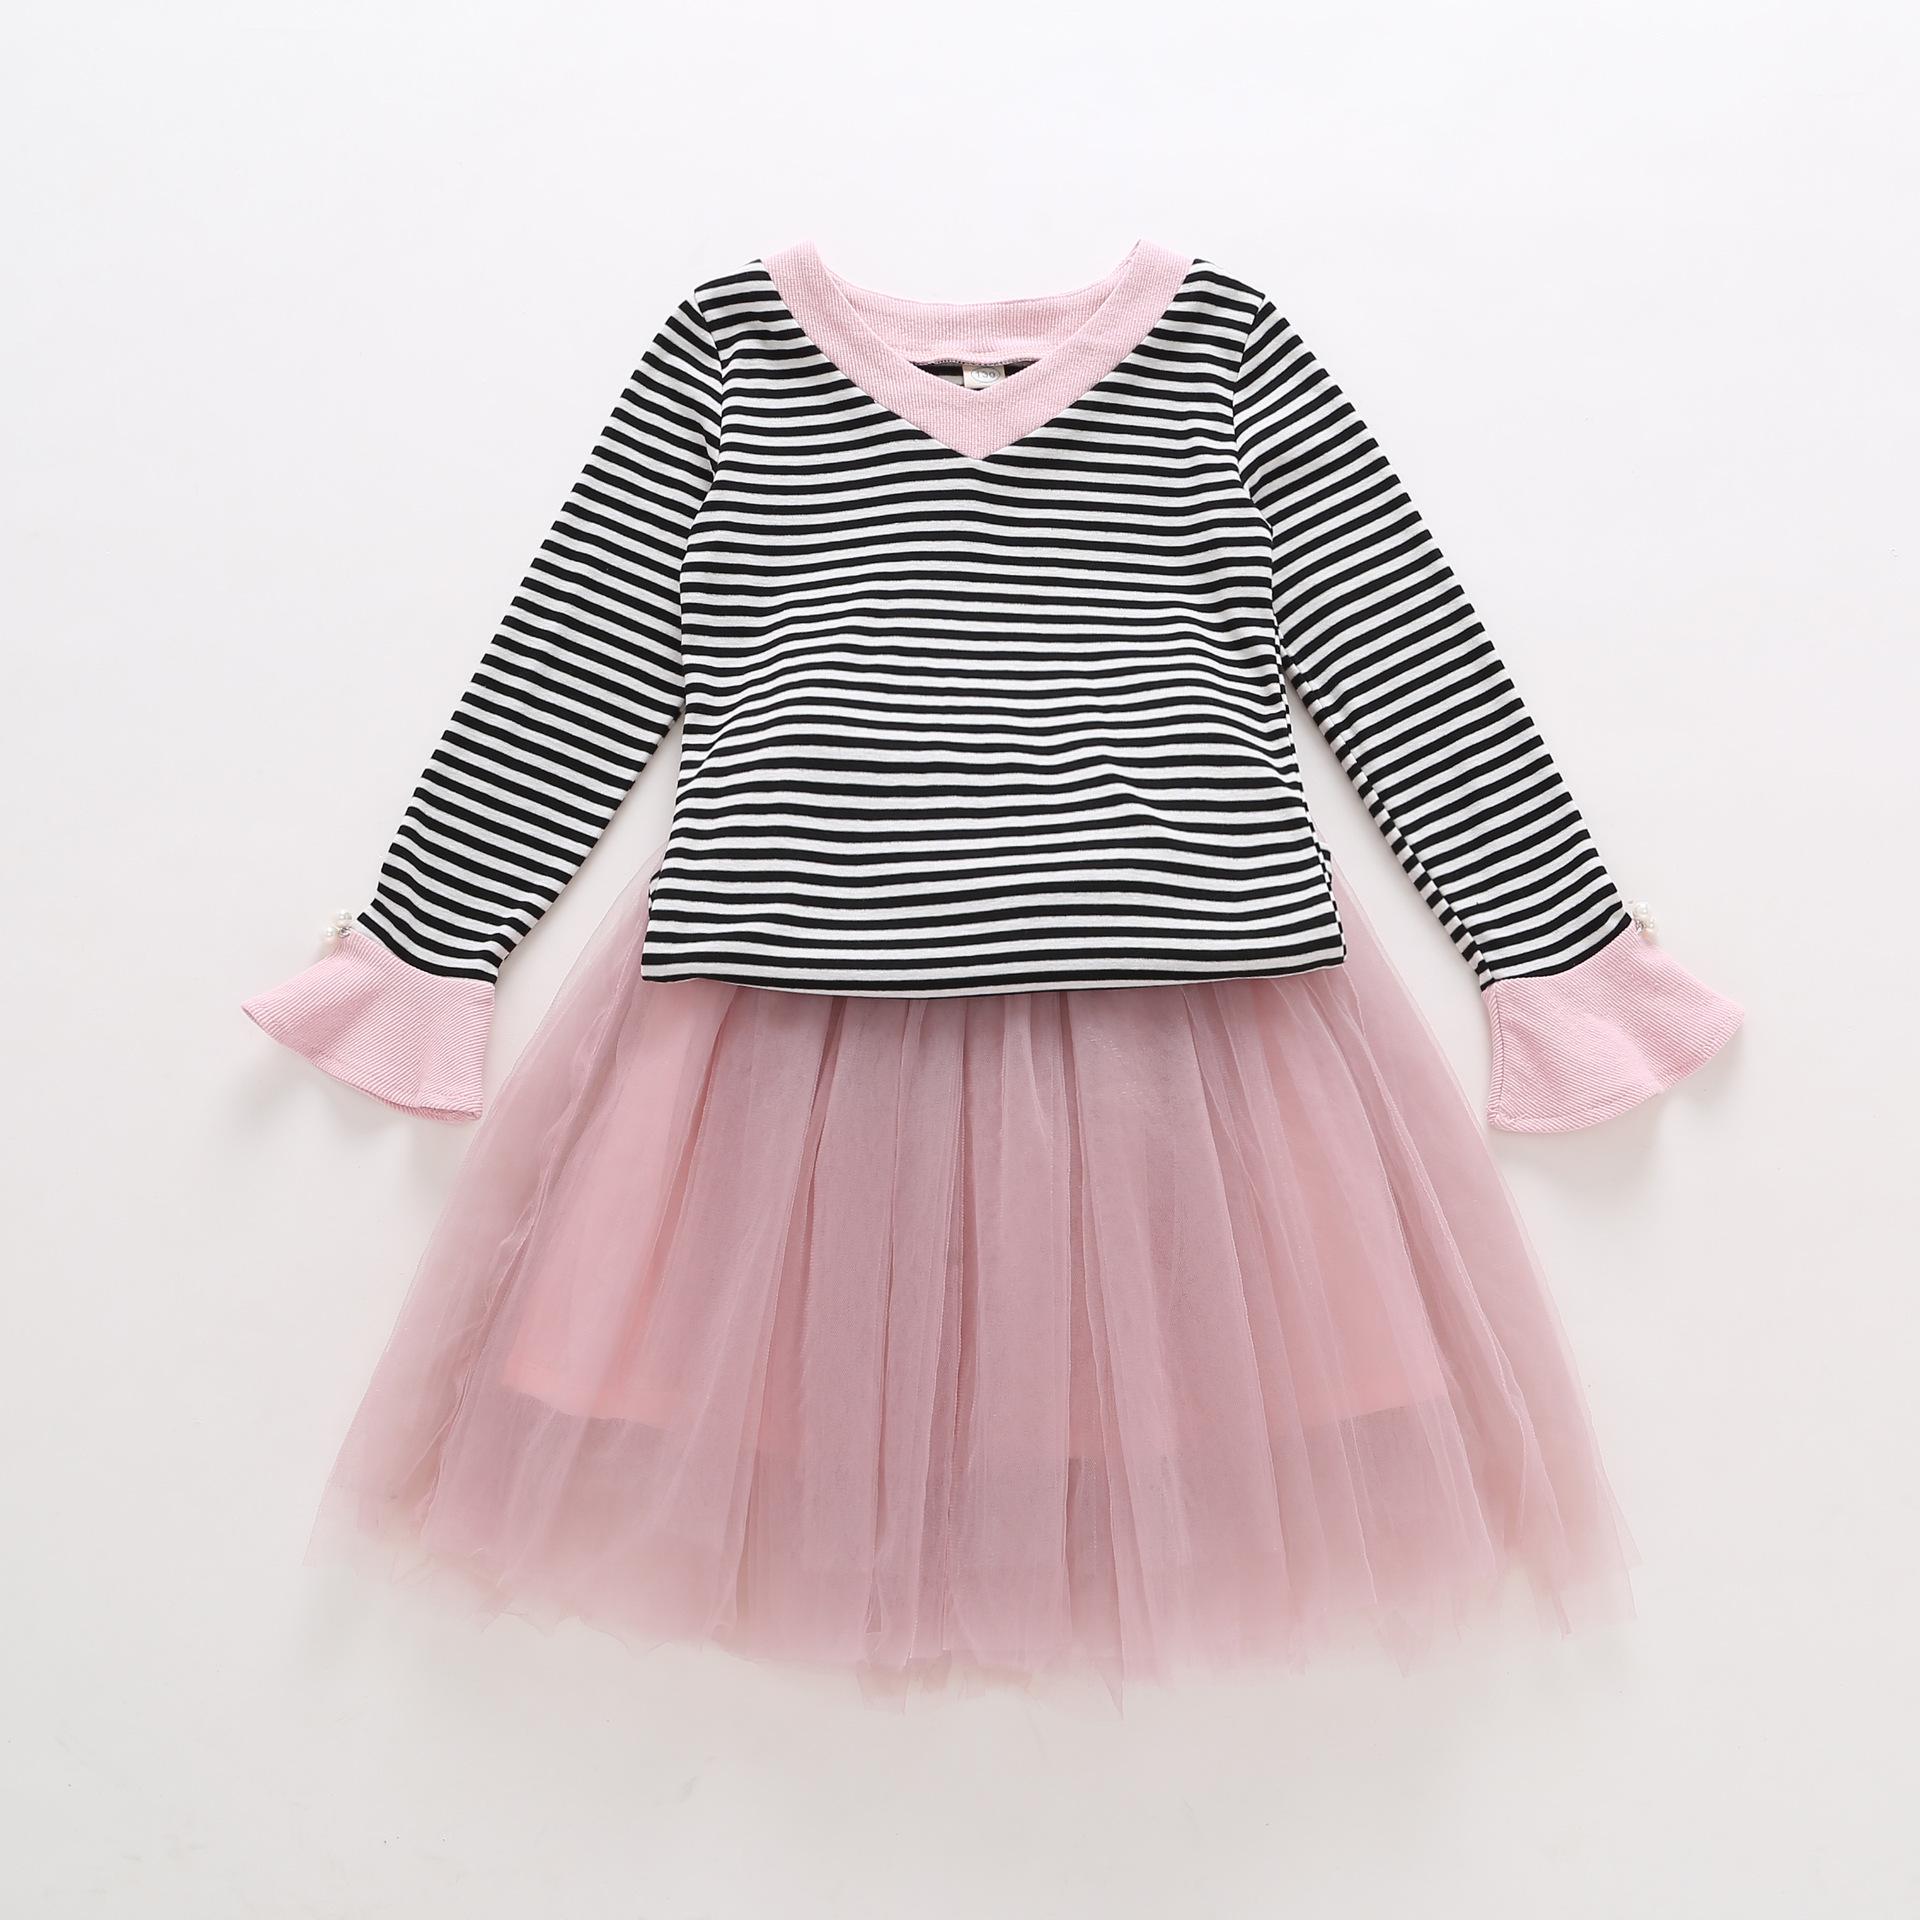 177244ad35f1 New Summer Cotton Linen T Shirt + Wide Leg Pant 2Pcs Suit Kids Clothes Set  Girls Clothing Set Teen Girls Outfits Sets CA595USD 16.56-17.20 set